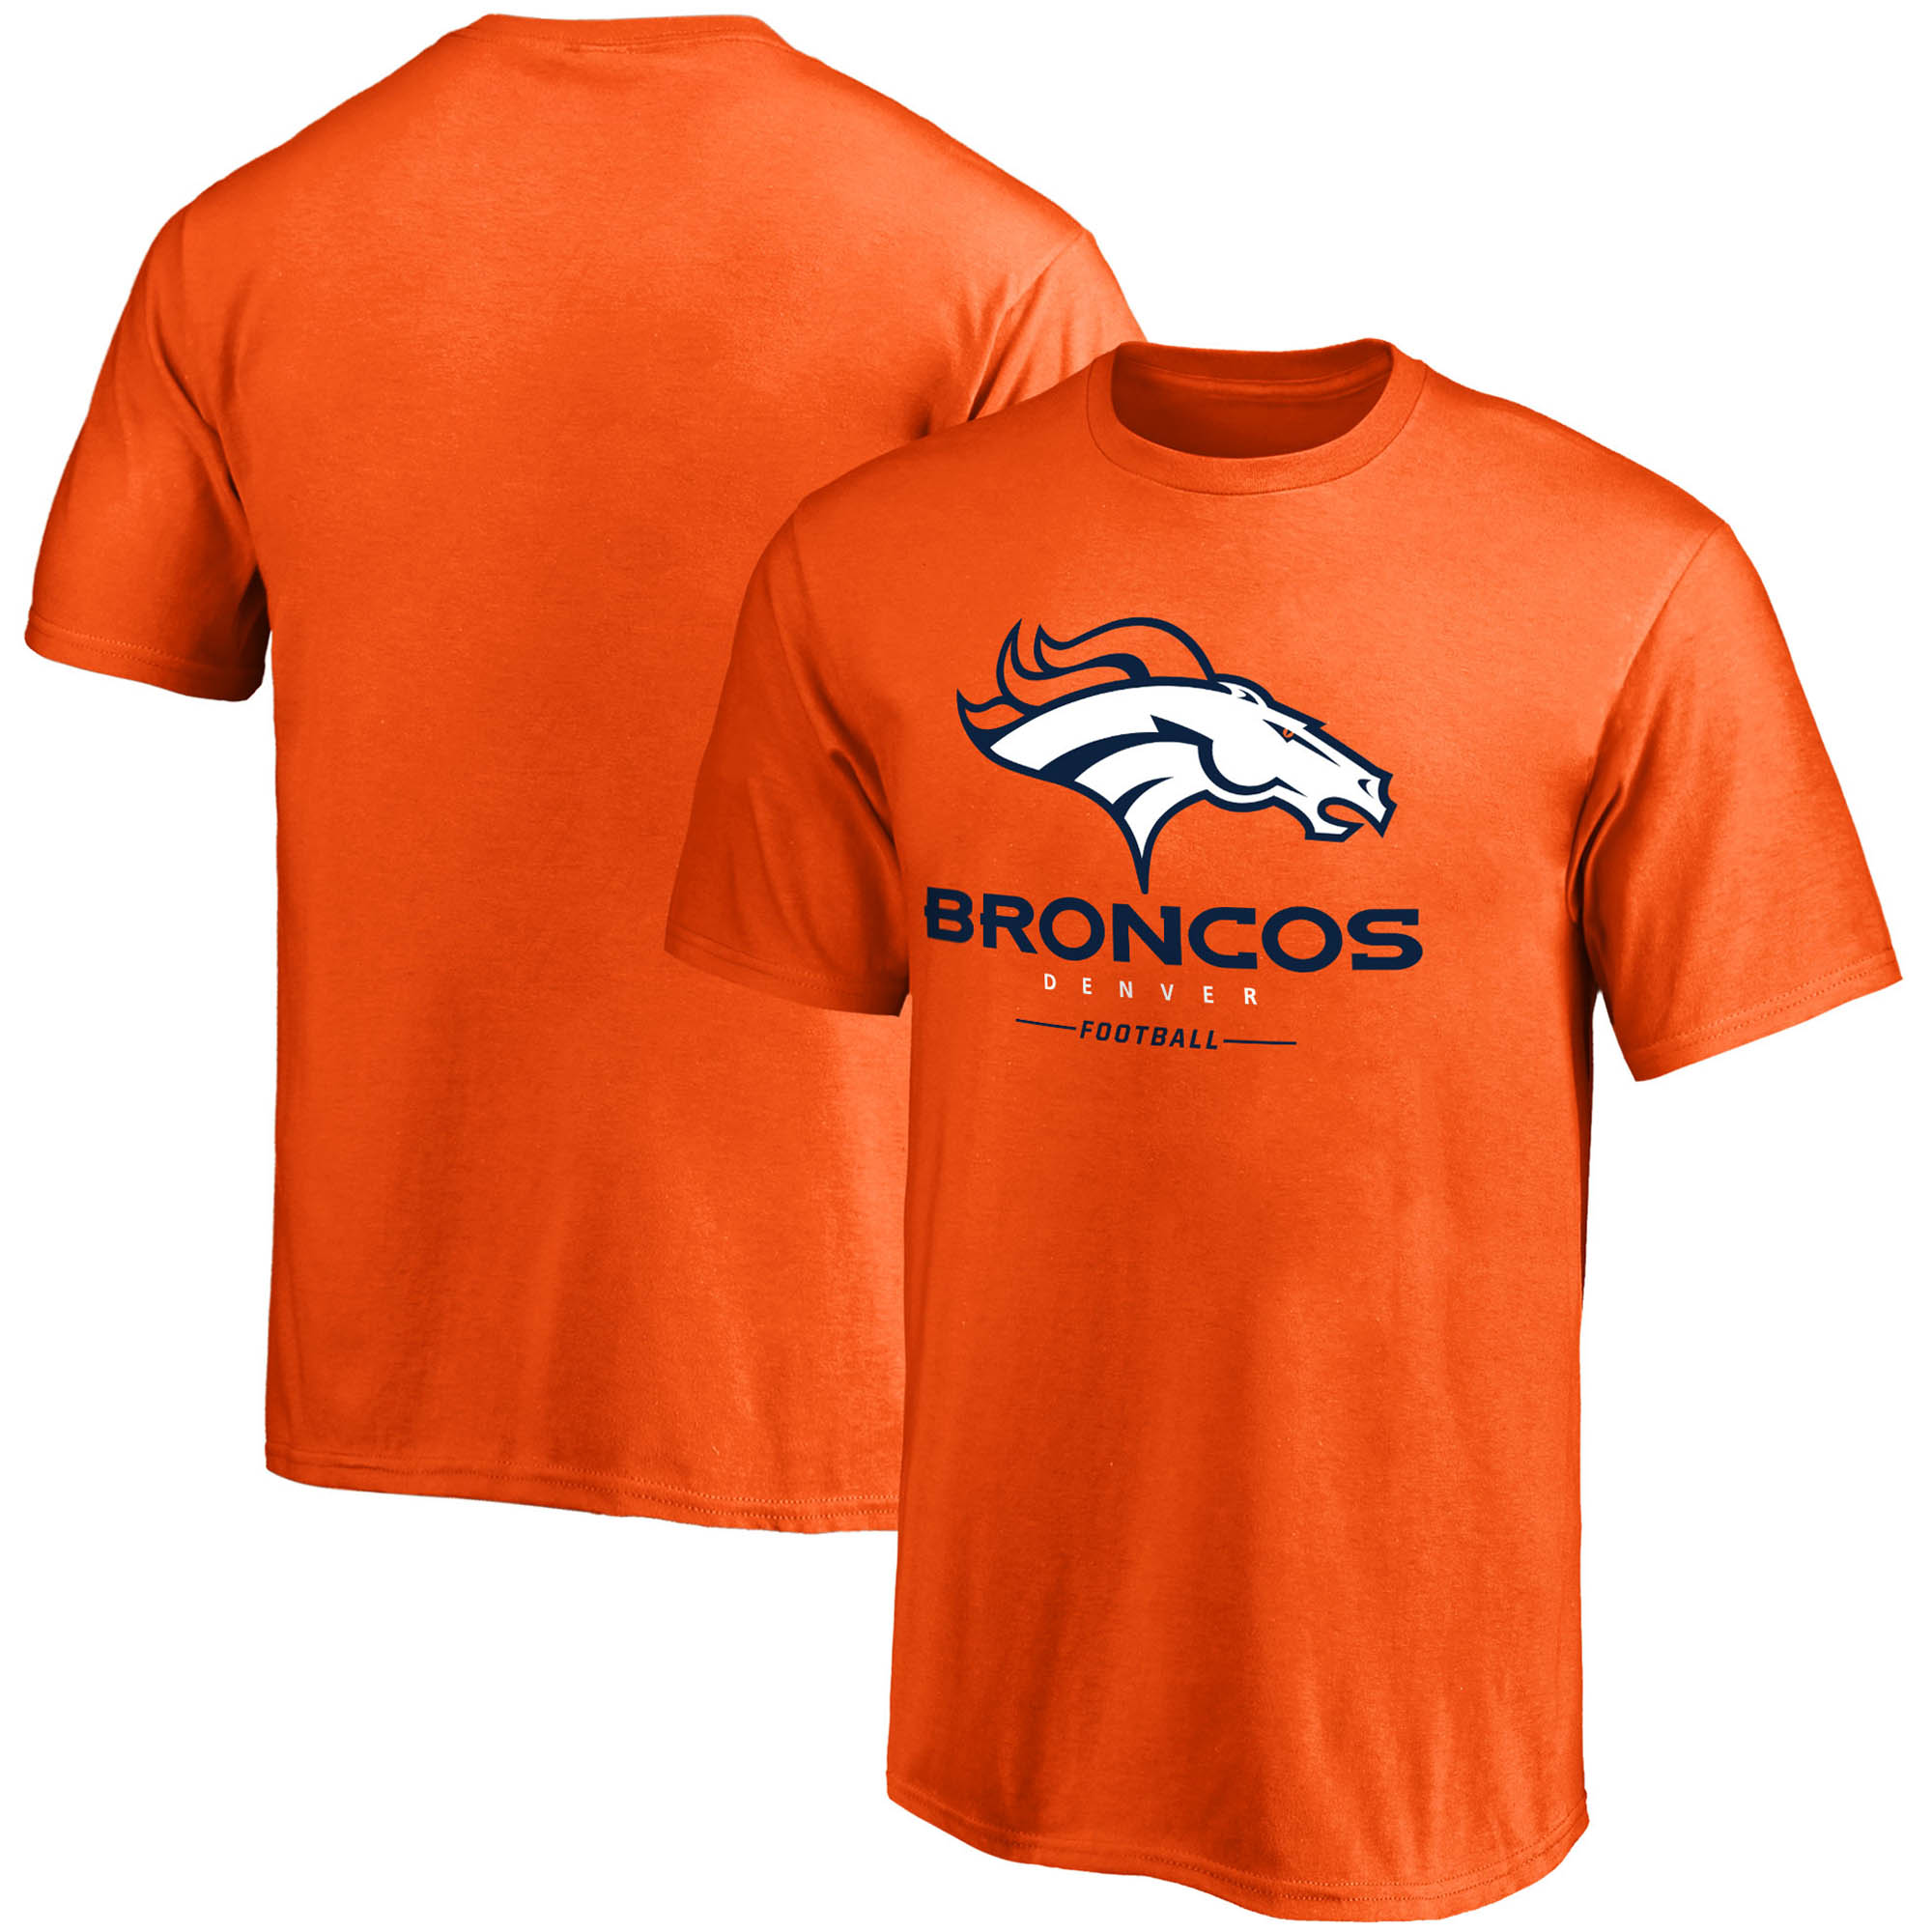 Denver Broncos NFL Pro Line by Fanatics Branded Youth Team Lockup - T-Shirt - Orange